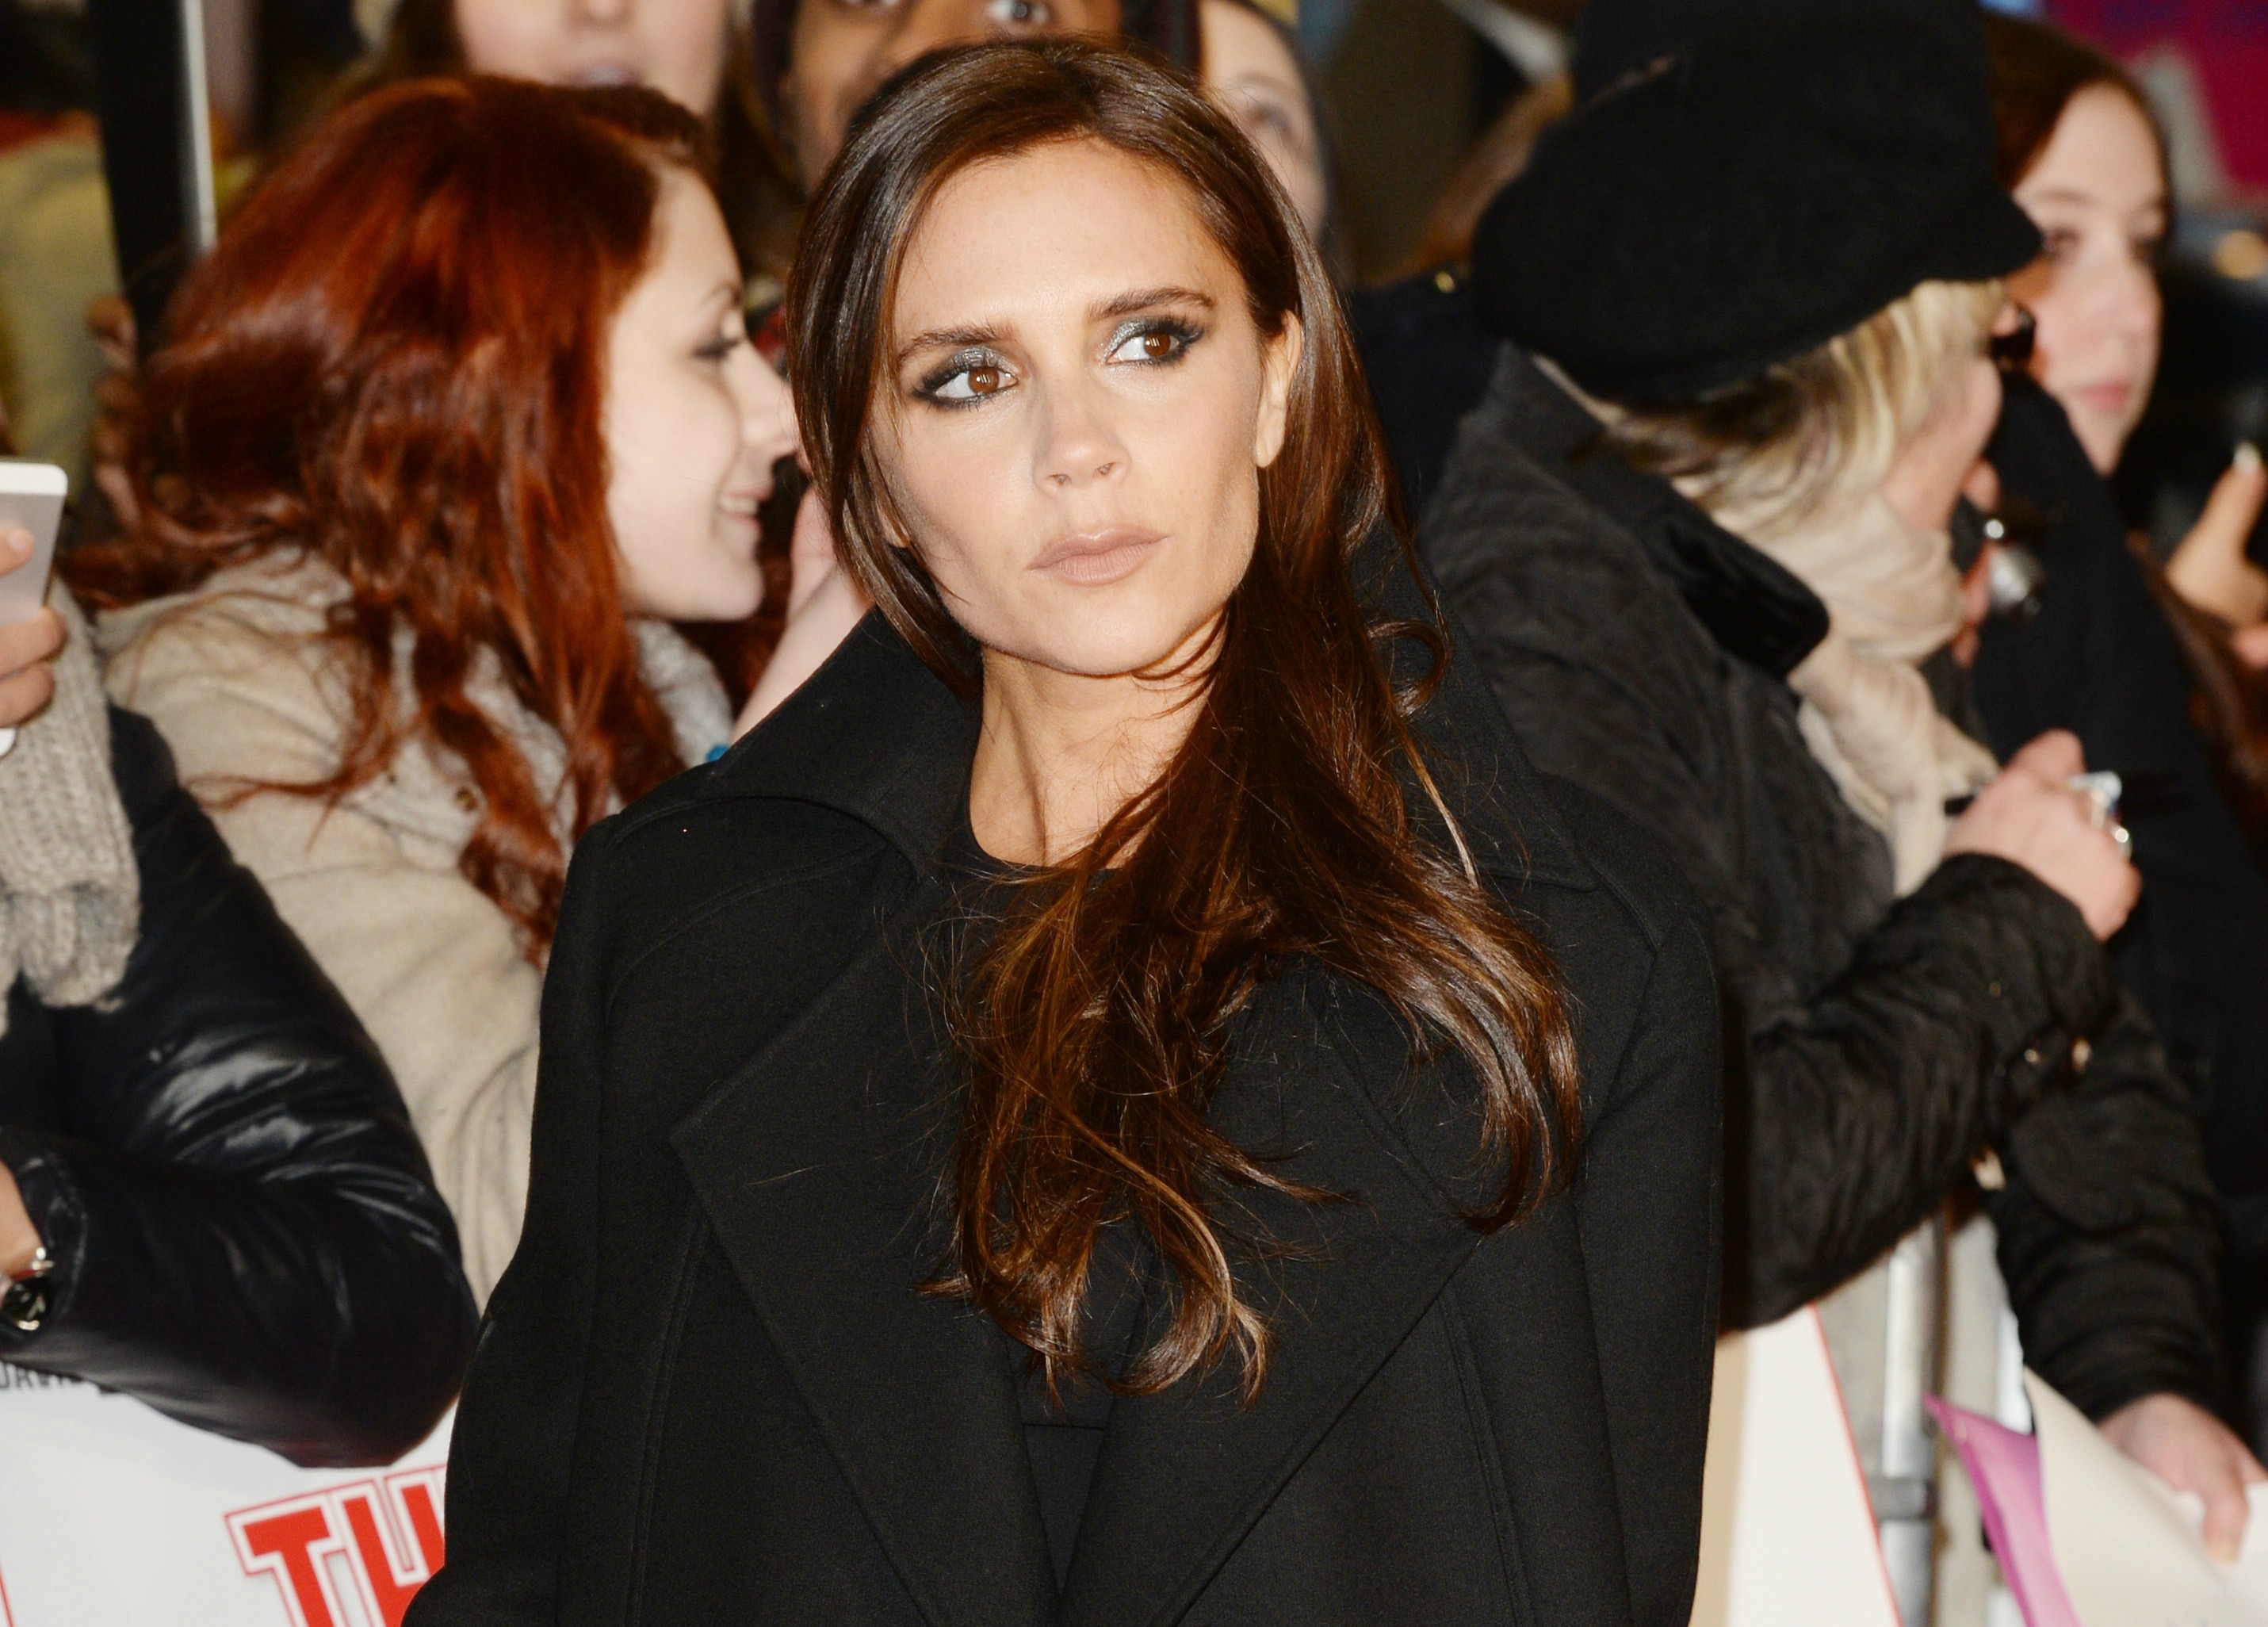 Reports claim that Victoria Beckham declined Kim Kardashian's wedding gown commission